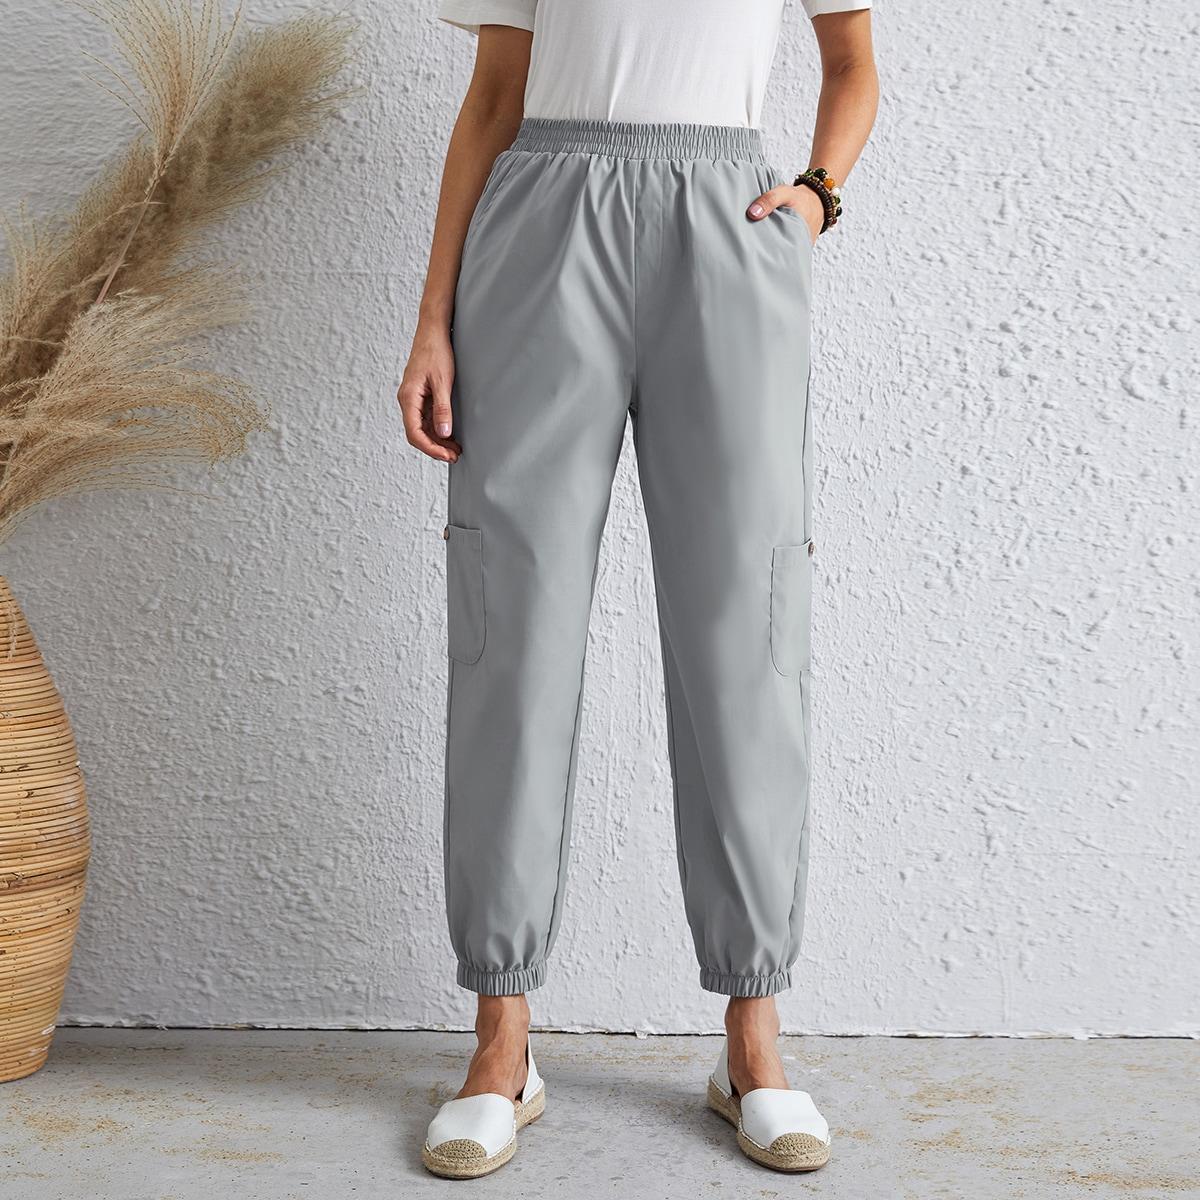 Solid Elastic Waist Pocket Carrot Pants